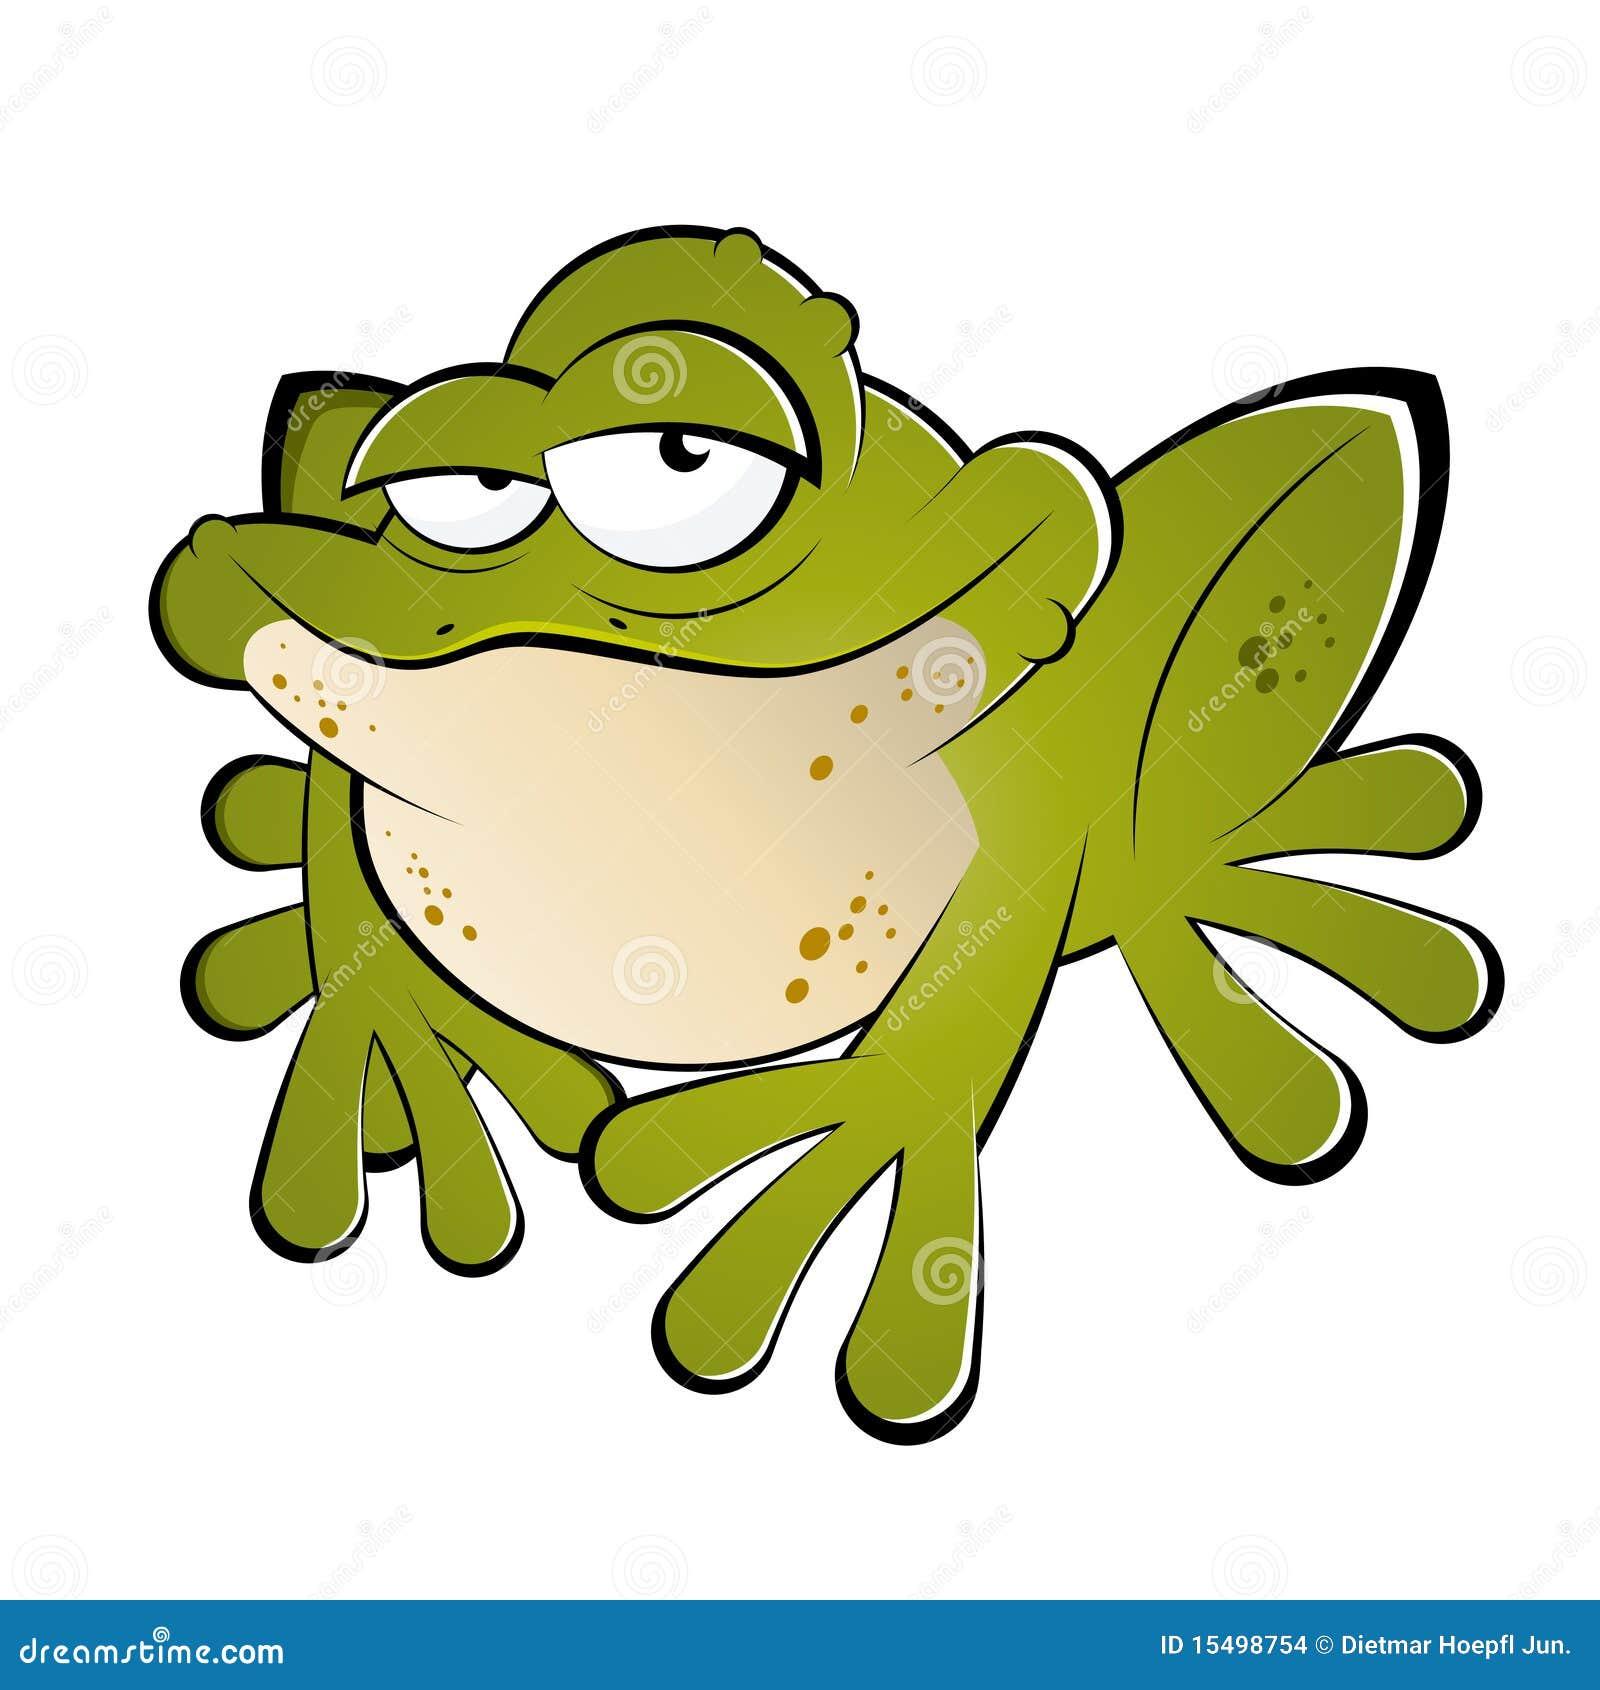 Grenouille verte de dessin anim images stock image 15498754 - Image de dessin anime ...